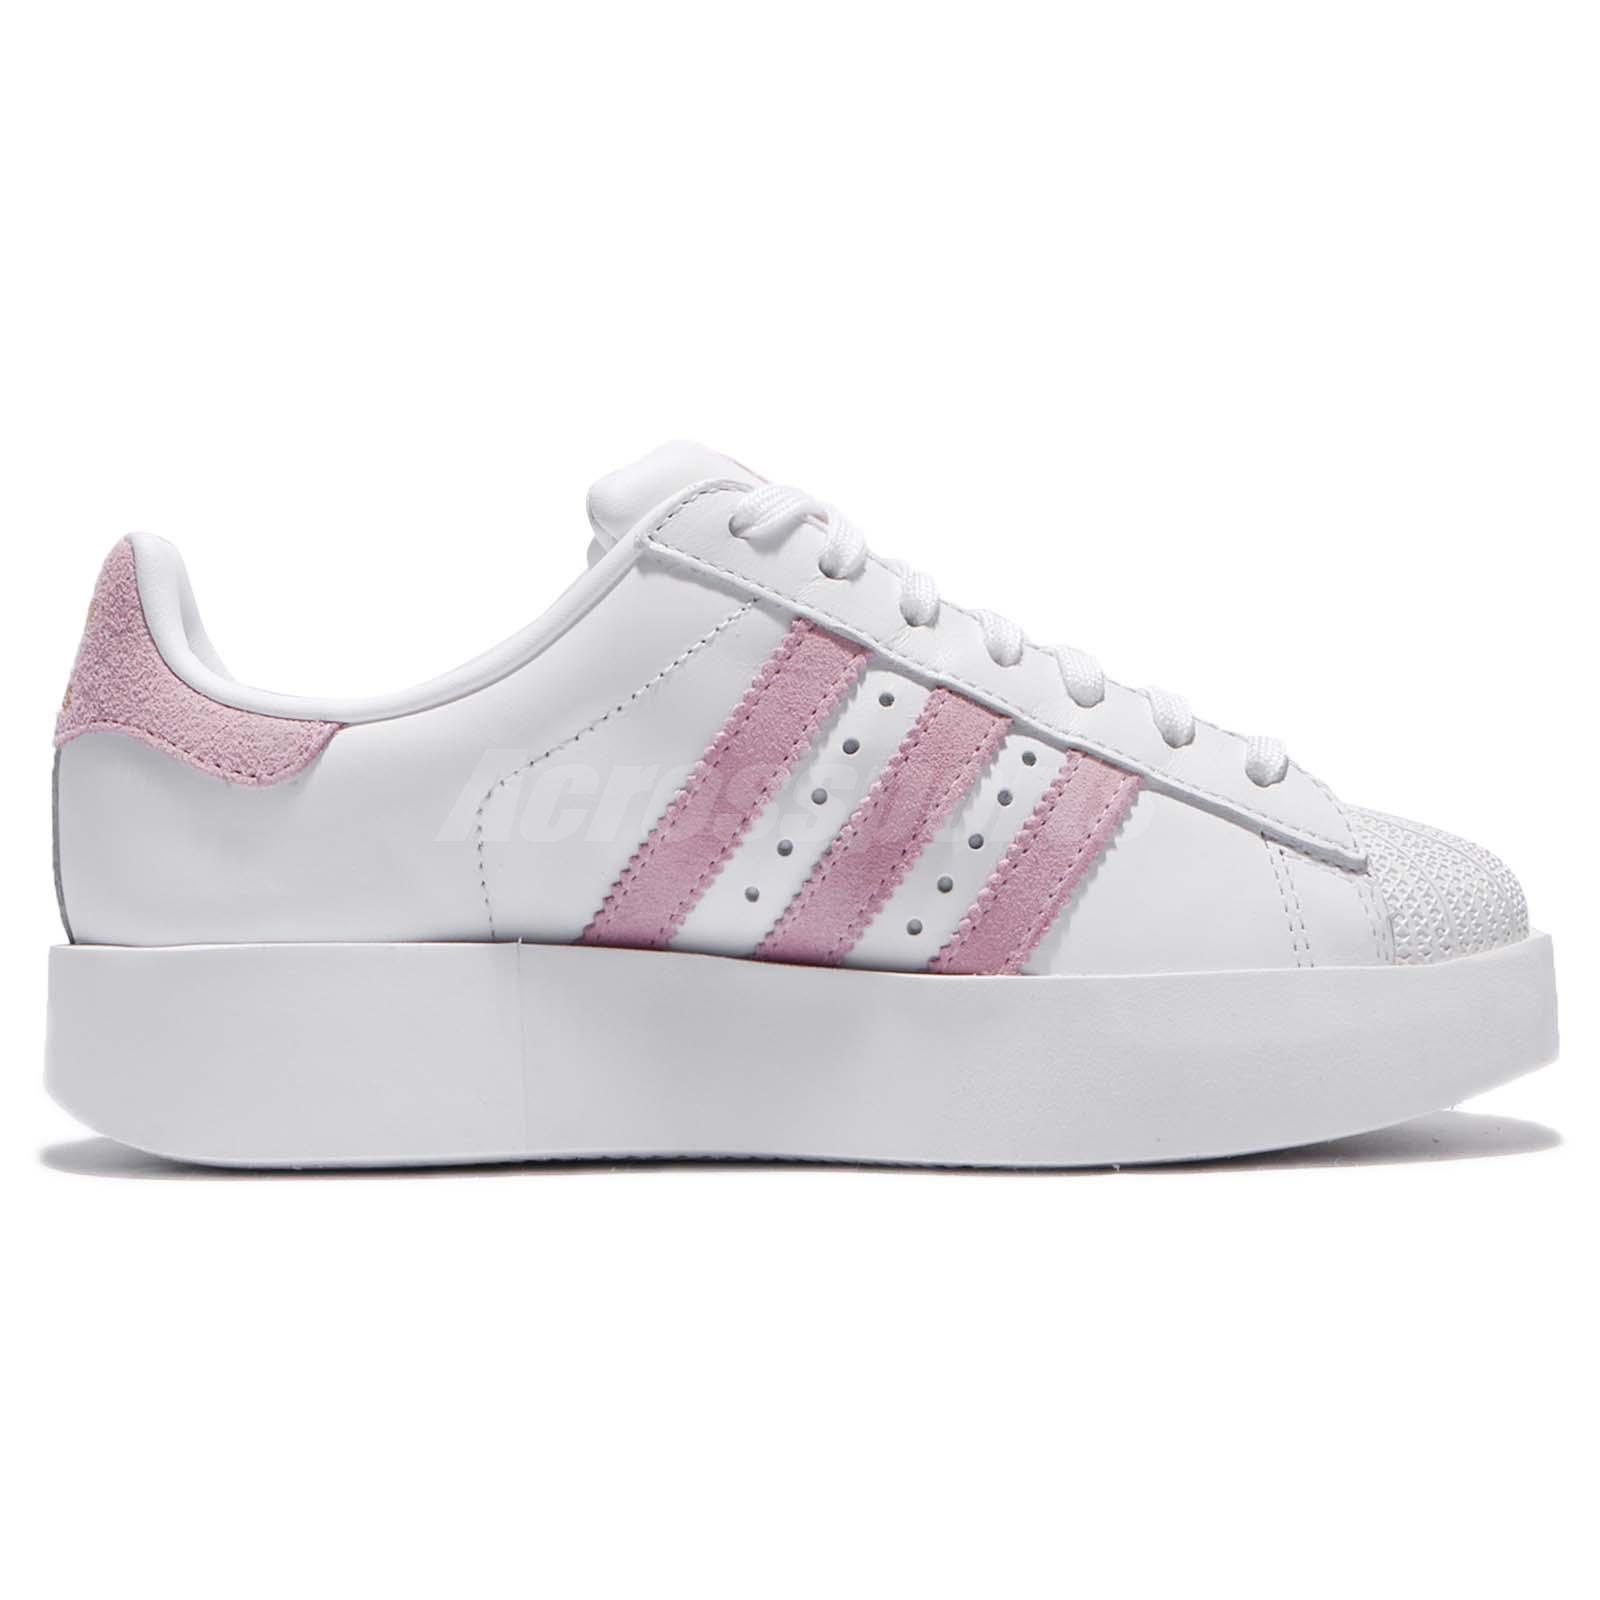 2a4cc3c8dac9 adidas Originals Superstar Bold W Platform White Pink Women Classic ...